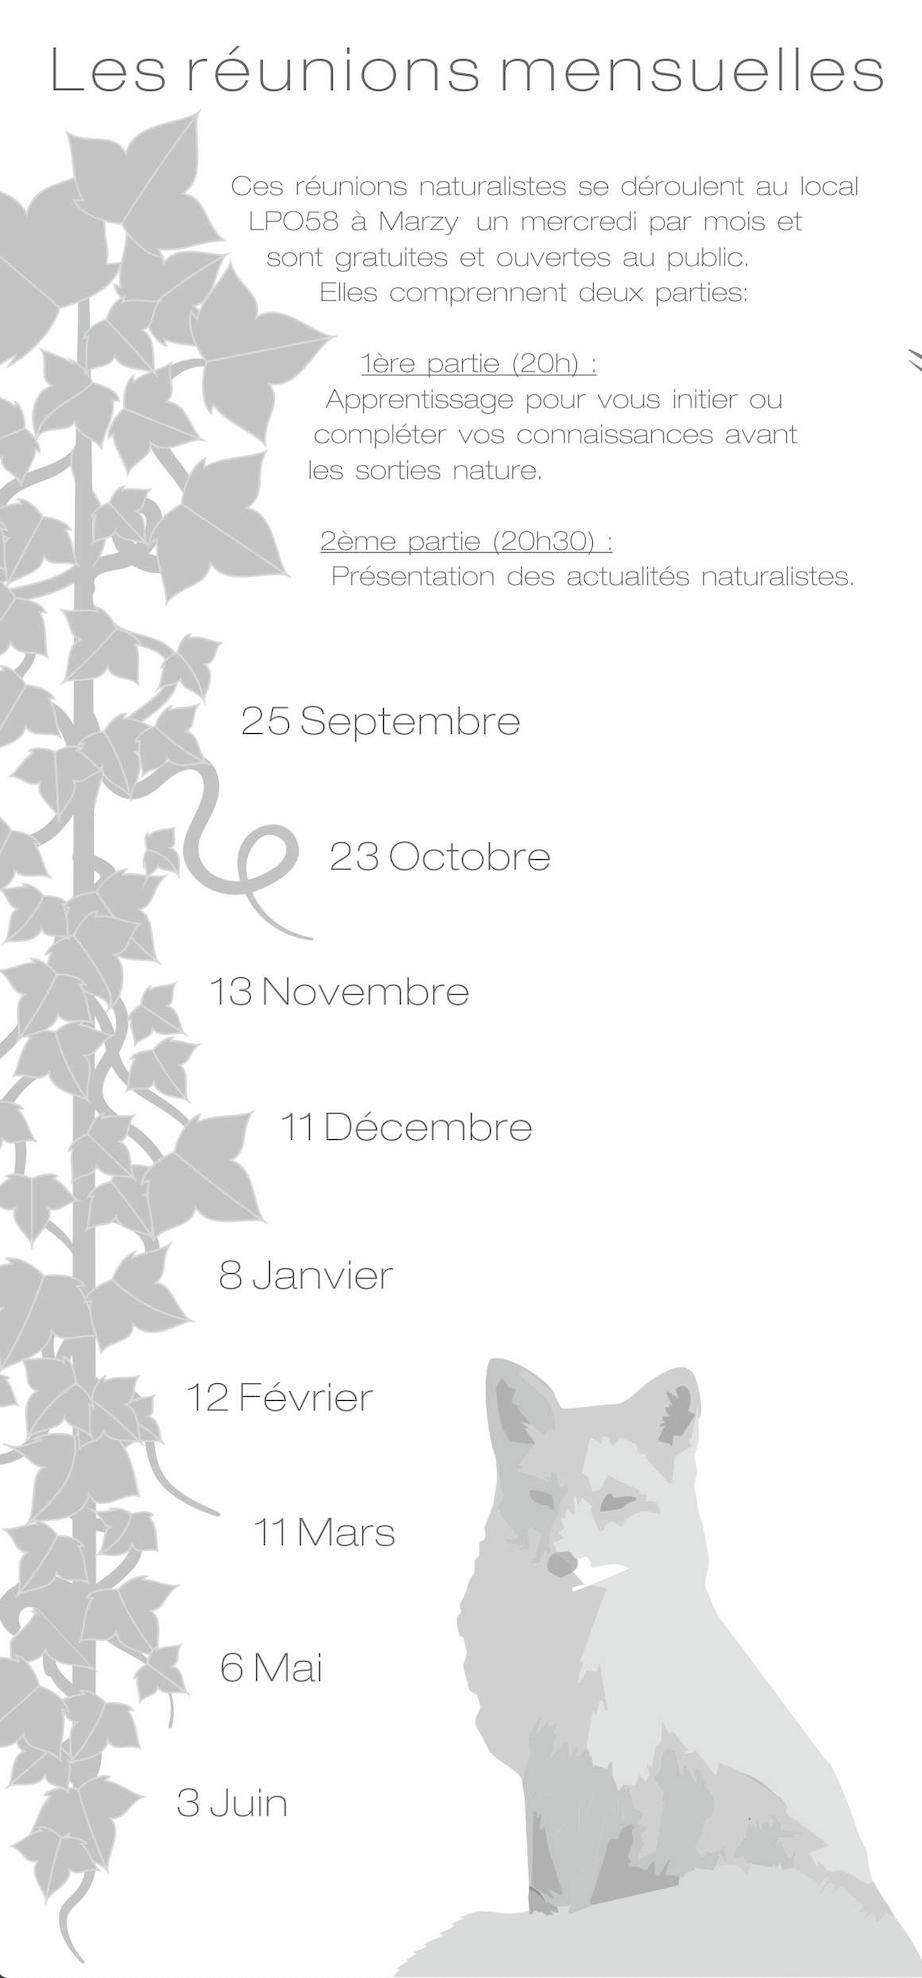 http://files.biolovision.net/www.faune-nievre.org/userfiles/calendrierseptembrejuin2020/Capturedecran2019-09-02a21.32.58.png